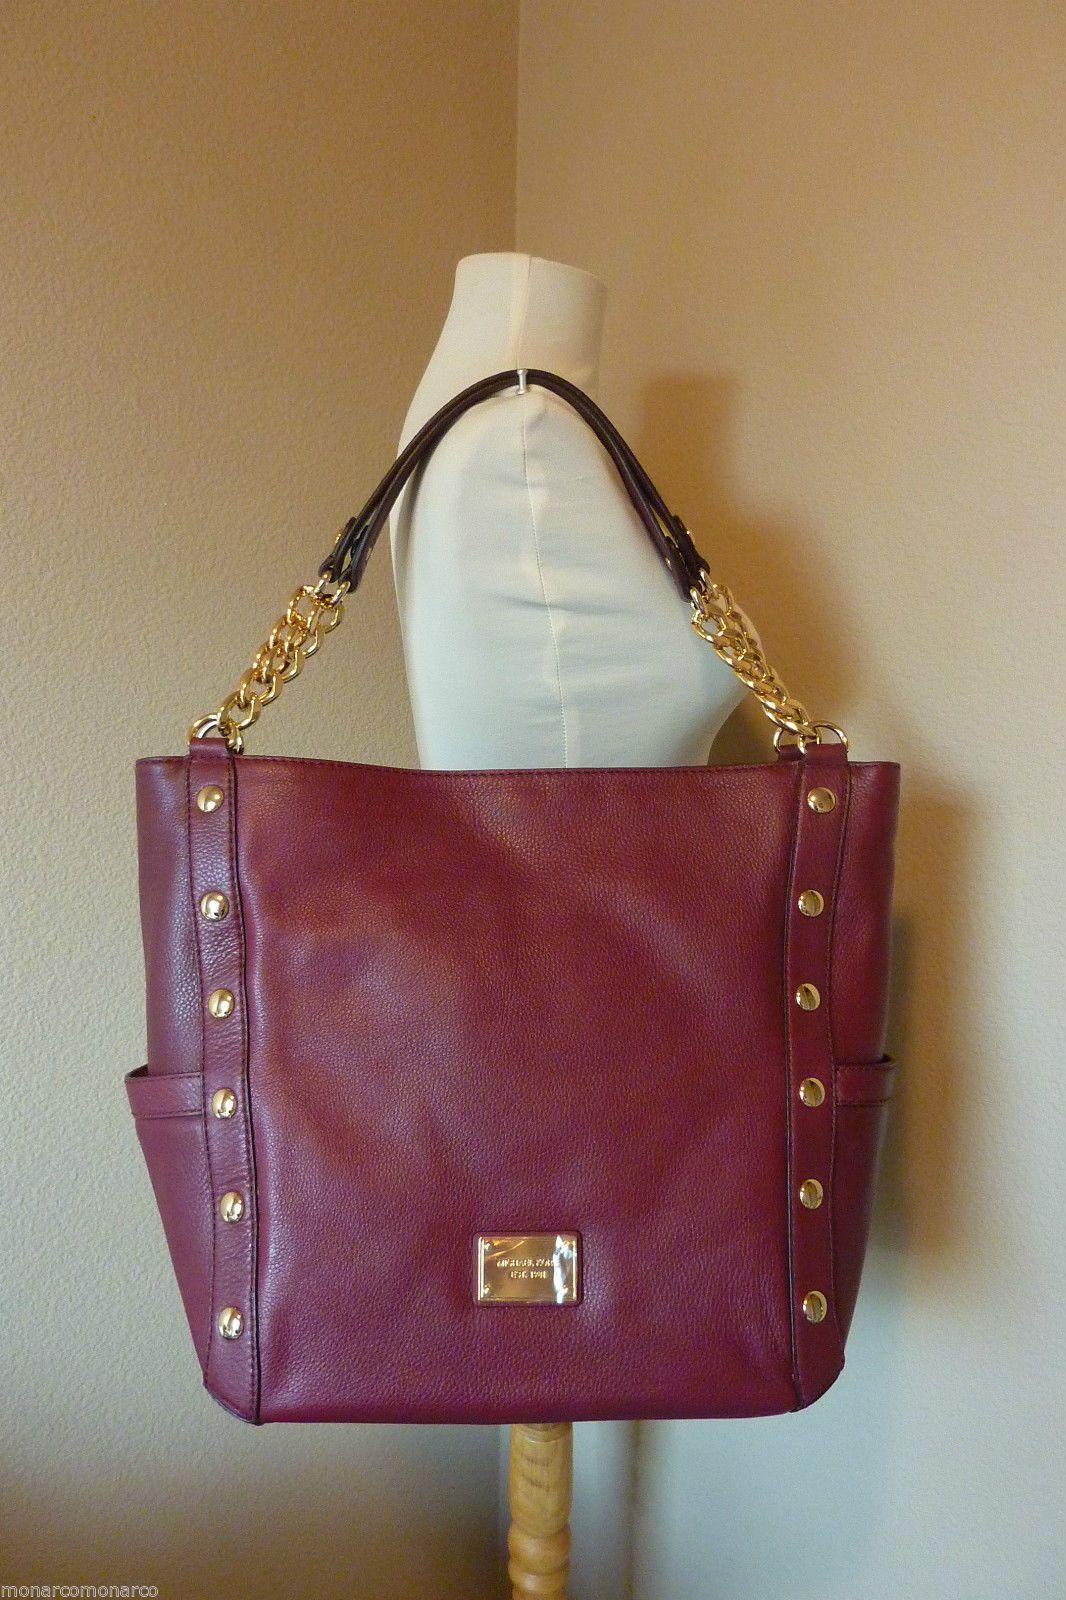 03ba9fe22fd8 Michael Kors Bordeaux Leather Delancy with Chain Large Shoulder Tote Bag  $498 | eBay